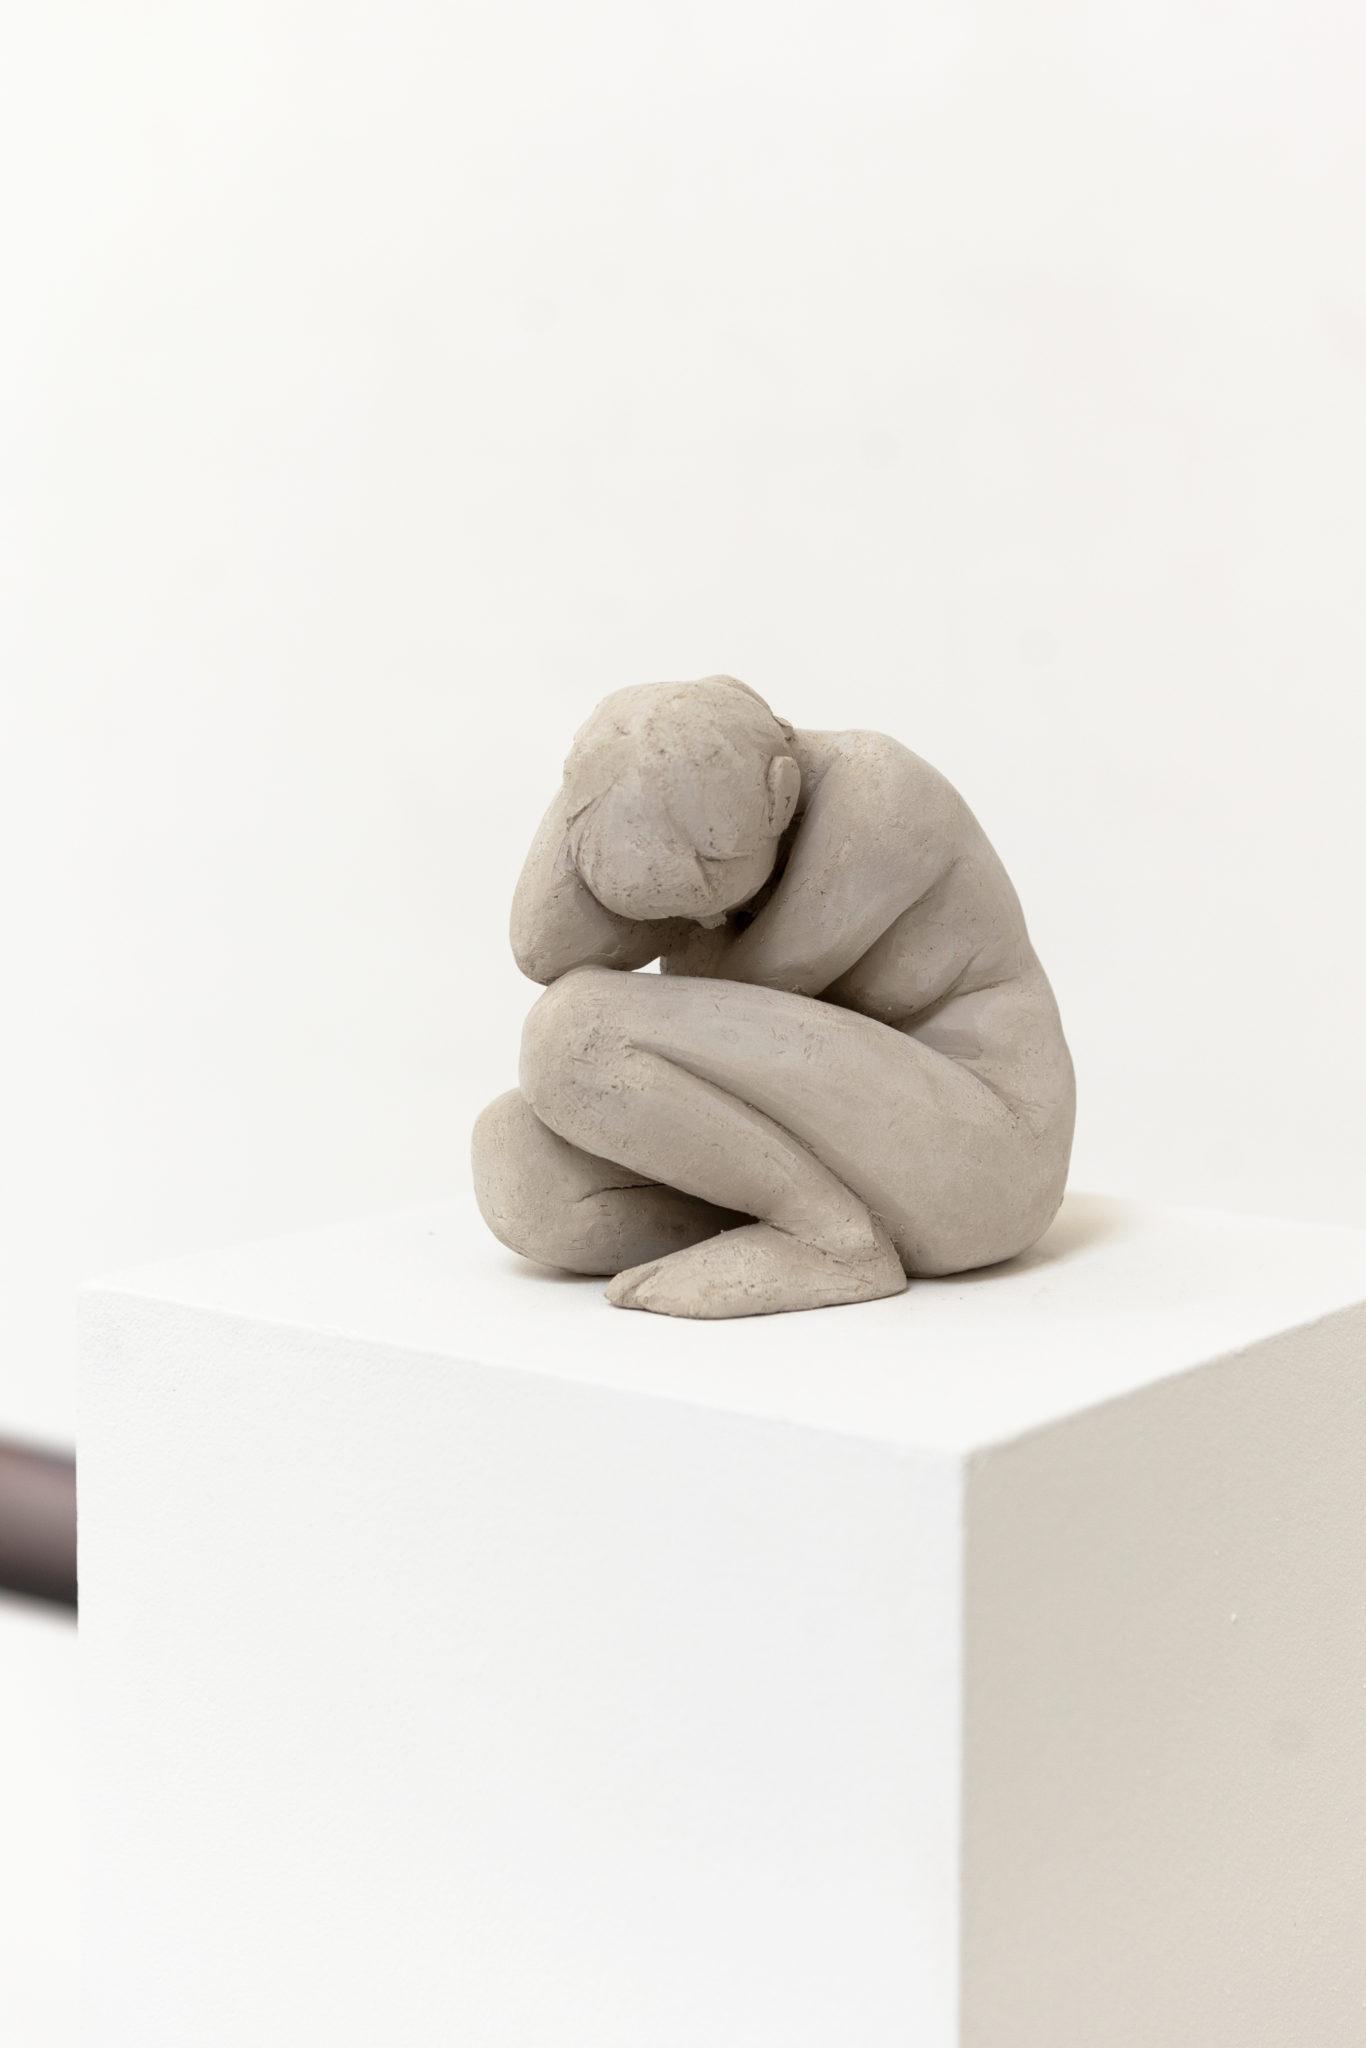 Franziska Dathe, Bedrückung, Ton (ungebrannt), 17 x 10 x 13 cm, 2021(1)